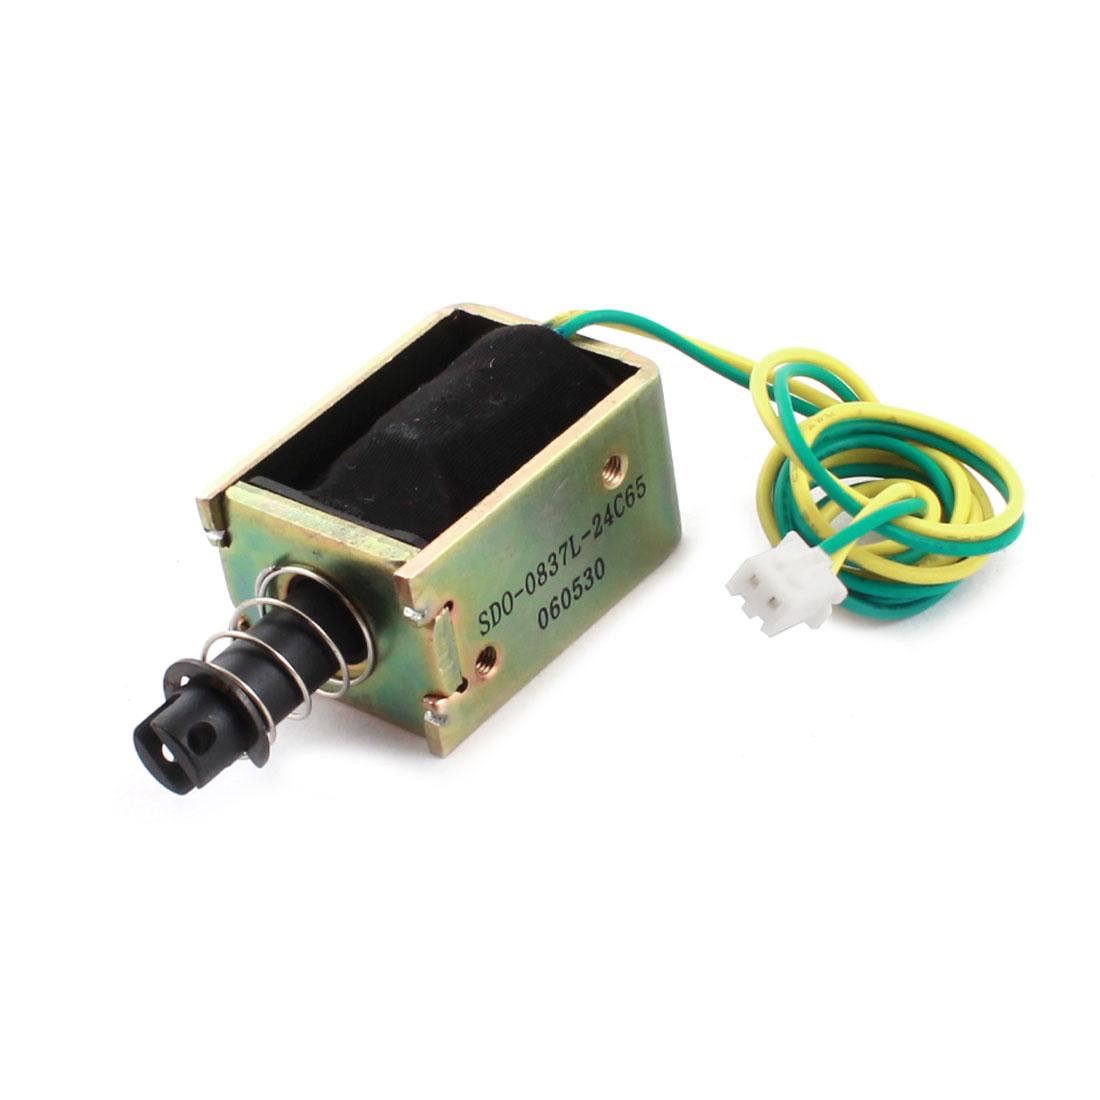 DC 24V 8.86W 400g/4mm Pull Open Frame Actuator Solenoid Electromagnet